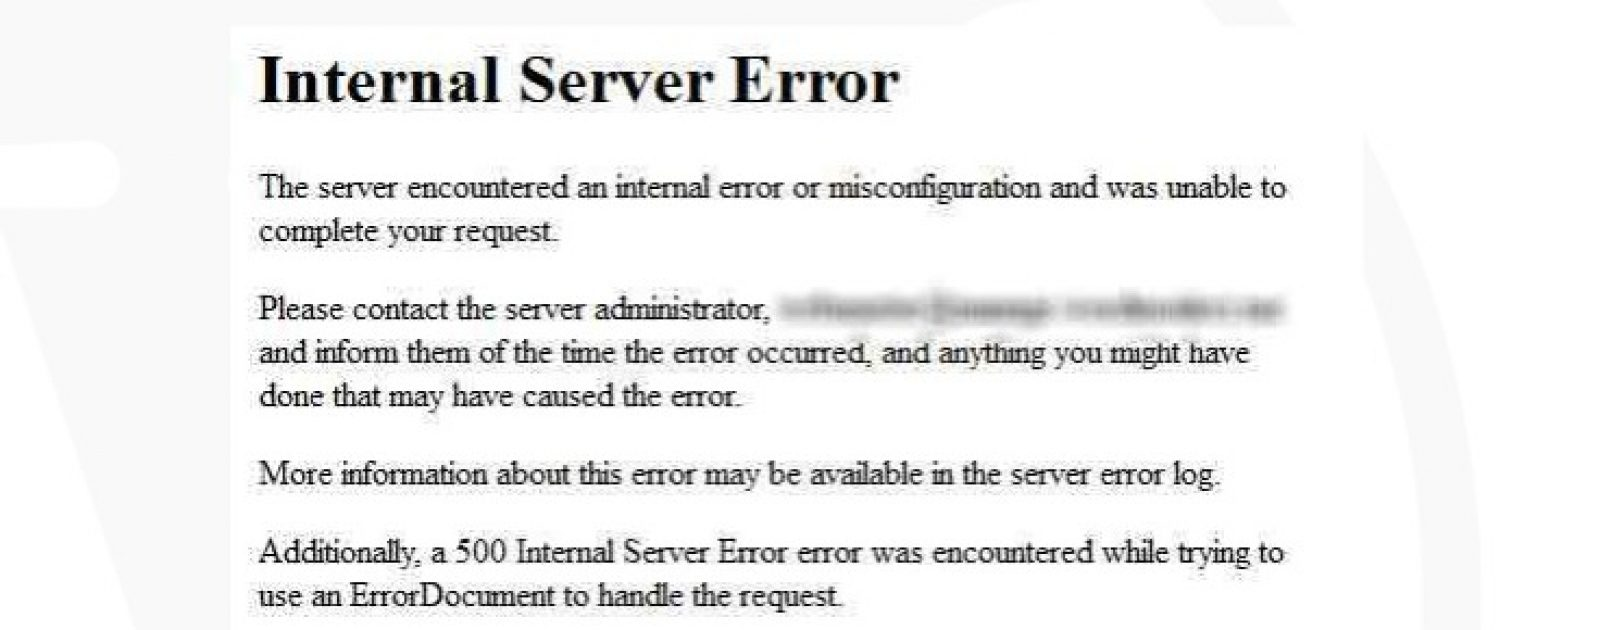 Mengatasi Internal Server Error   Jasa Pembuatan Website Terpercaya